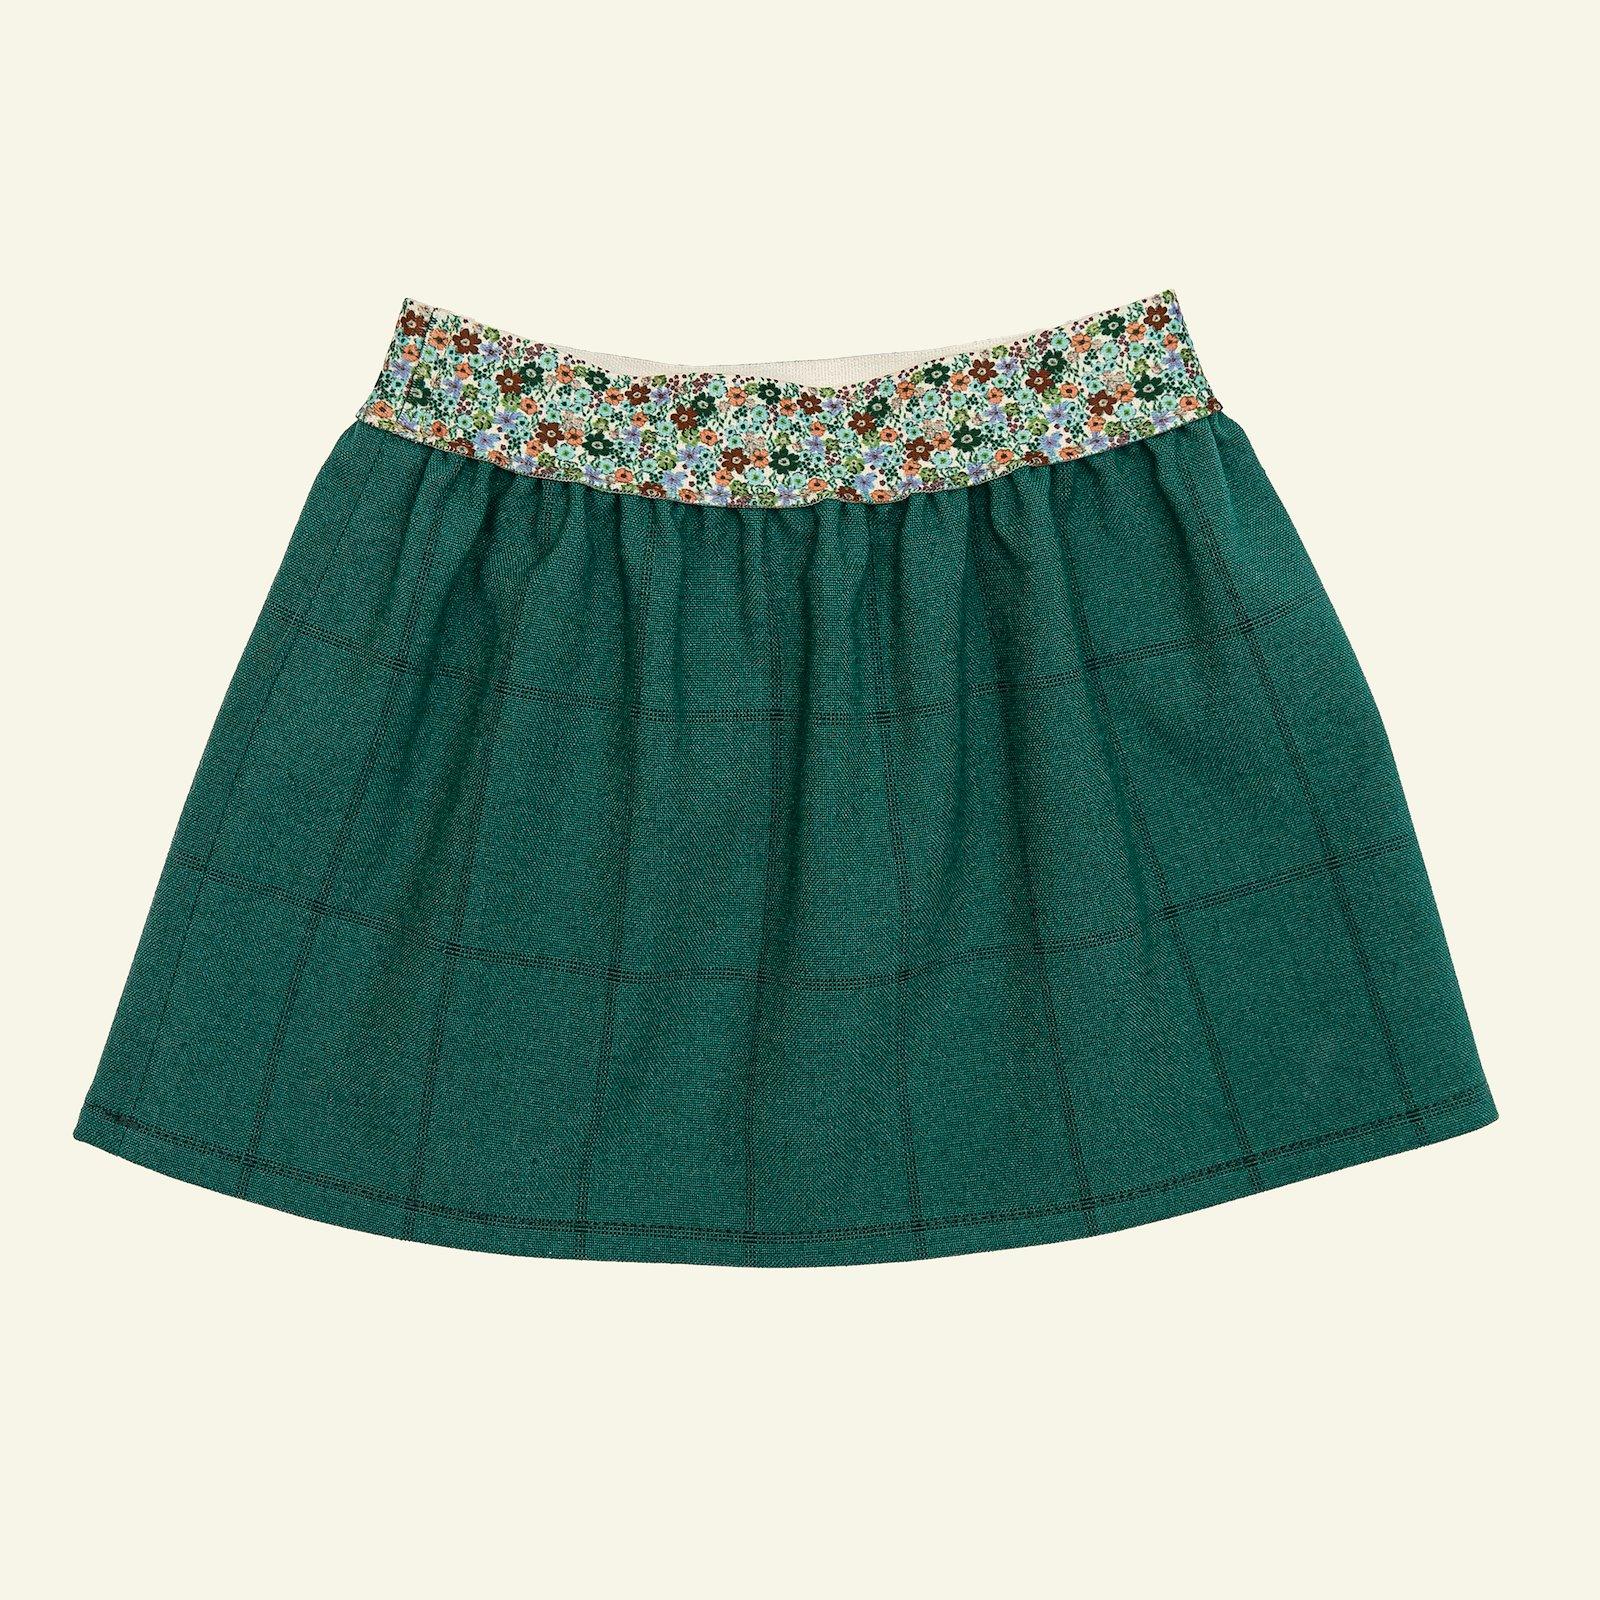 Bodysuit and skirt, 68/3m p81027_501791_3509077_sskit